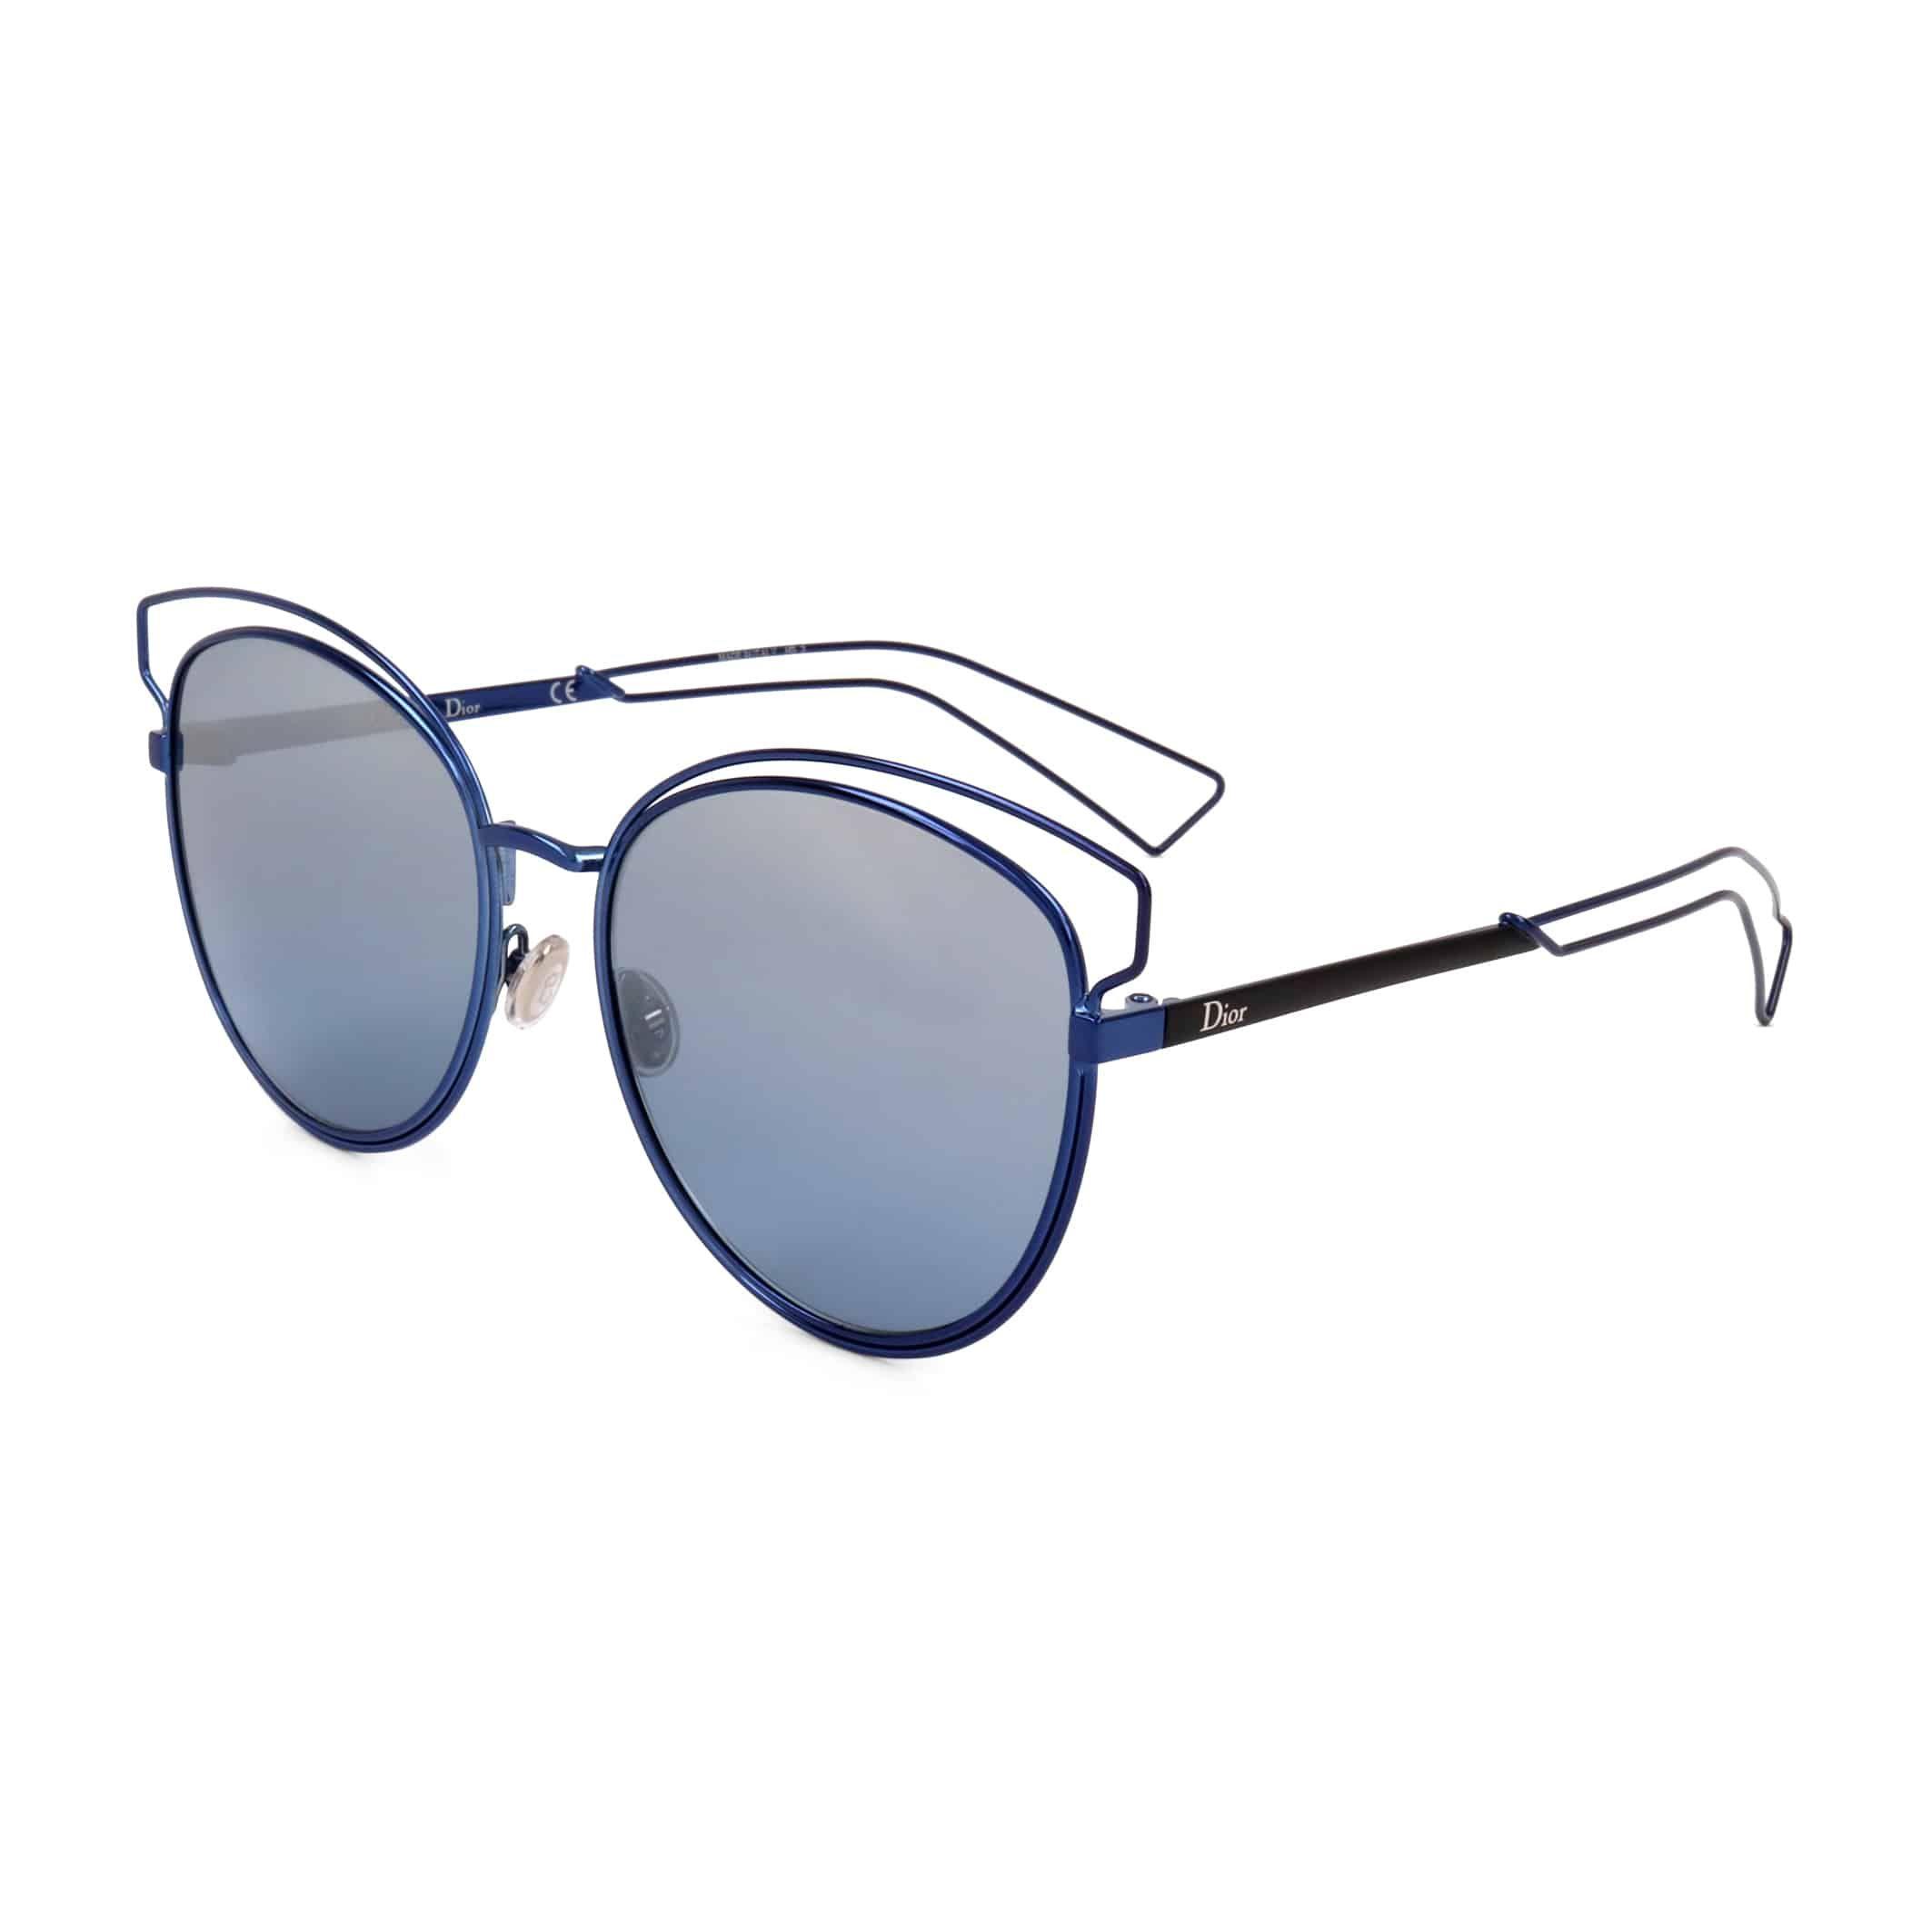 Dior – DIORSIDERAL2 – Azul